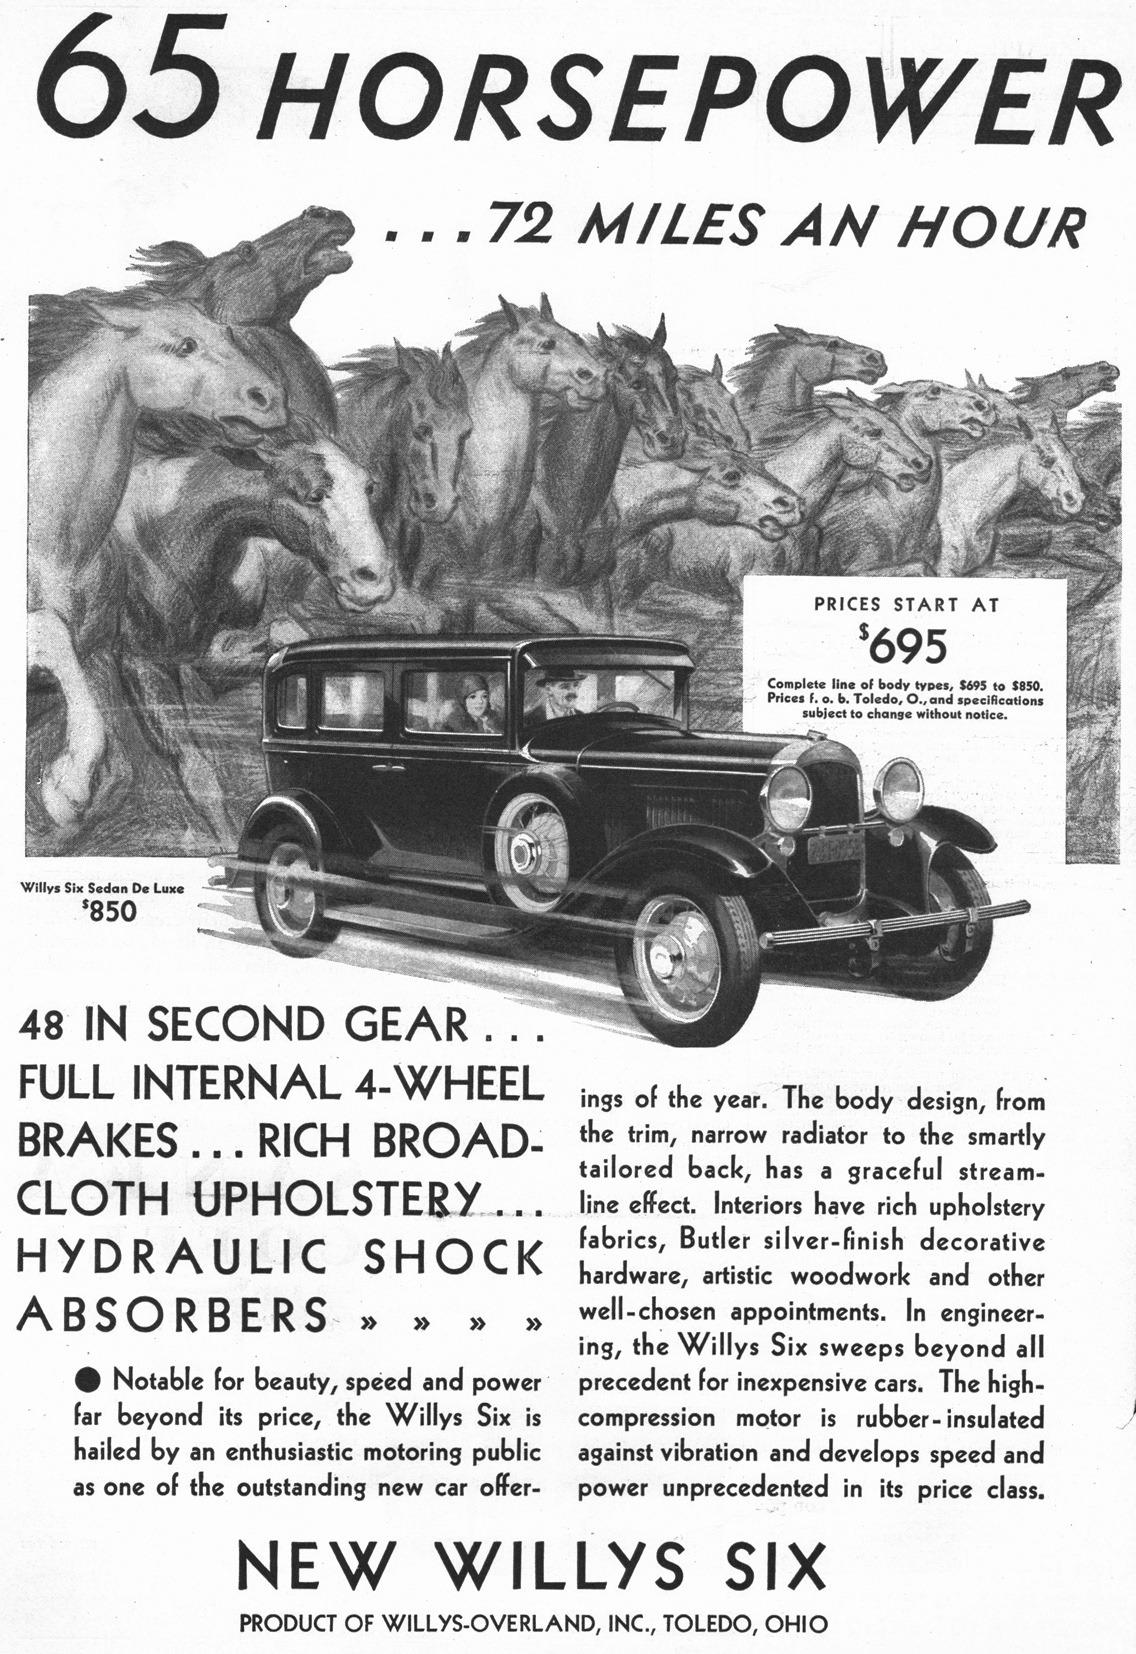 1930 Willys Six Sedan De Luxe